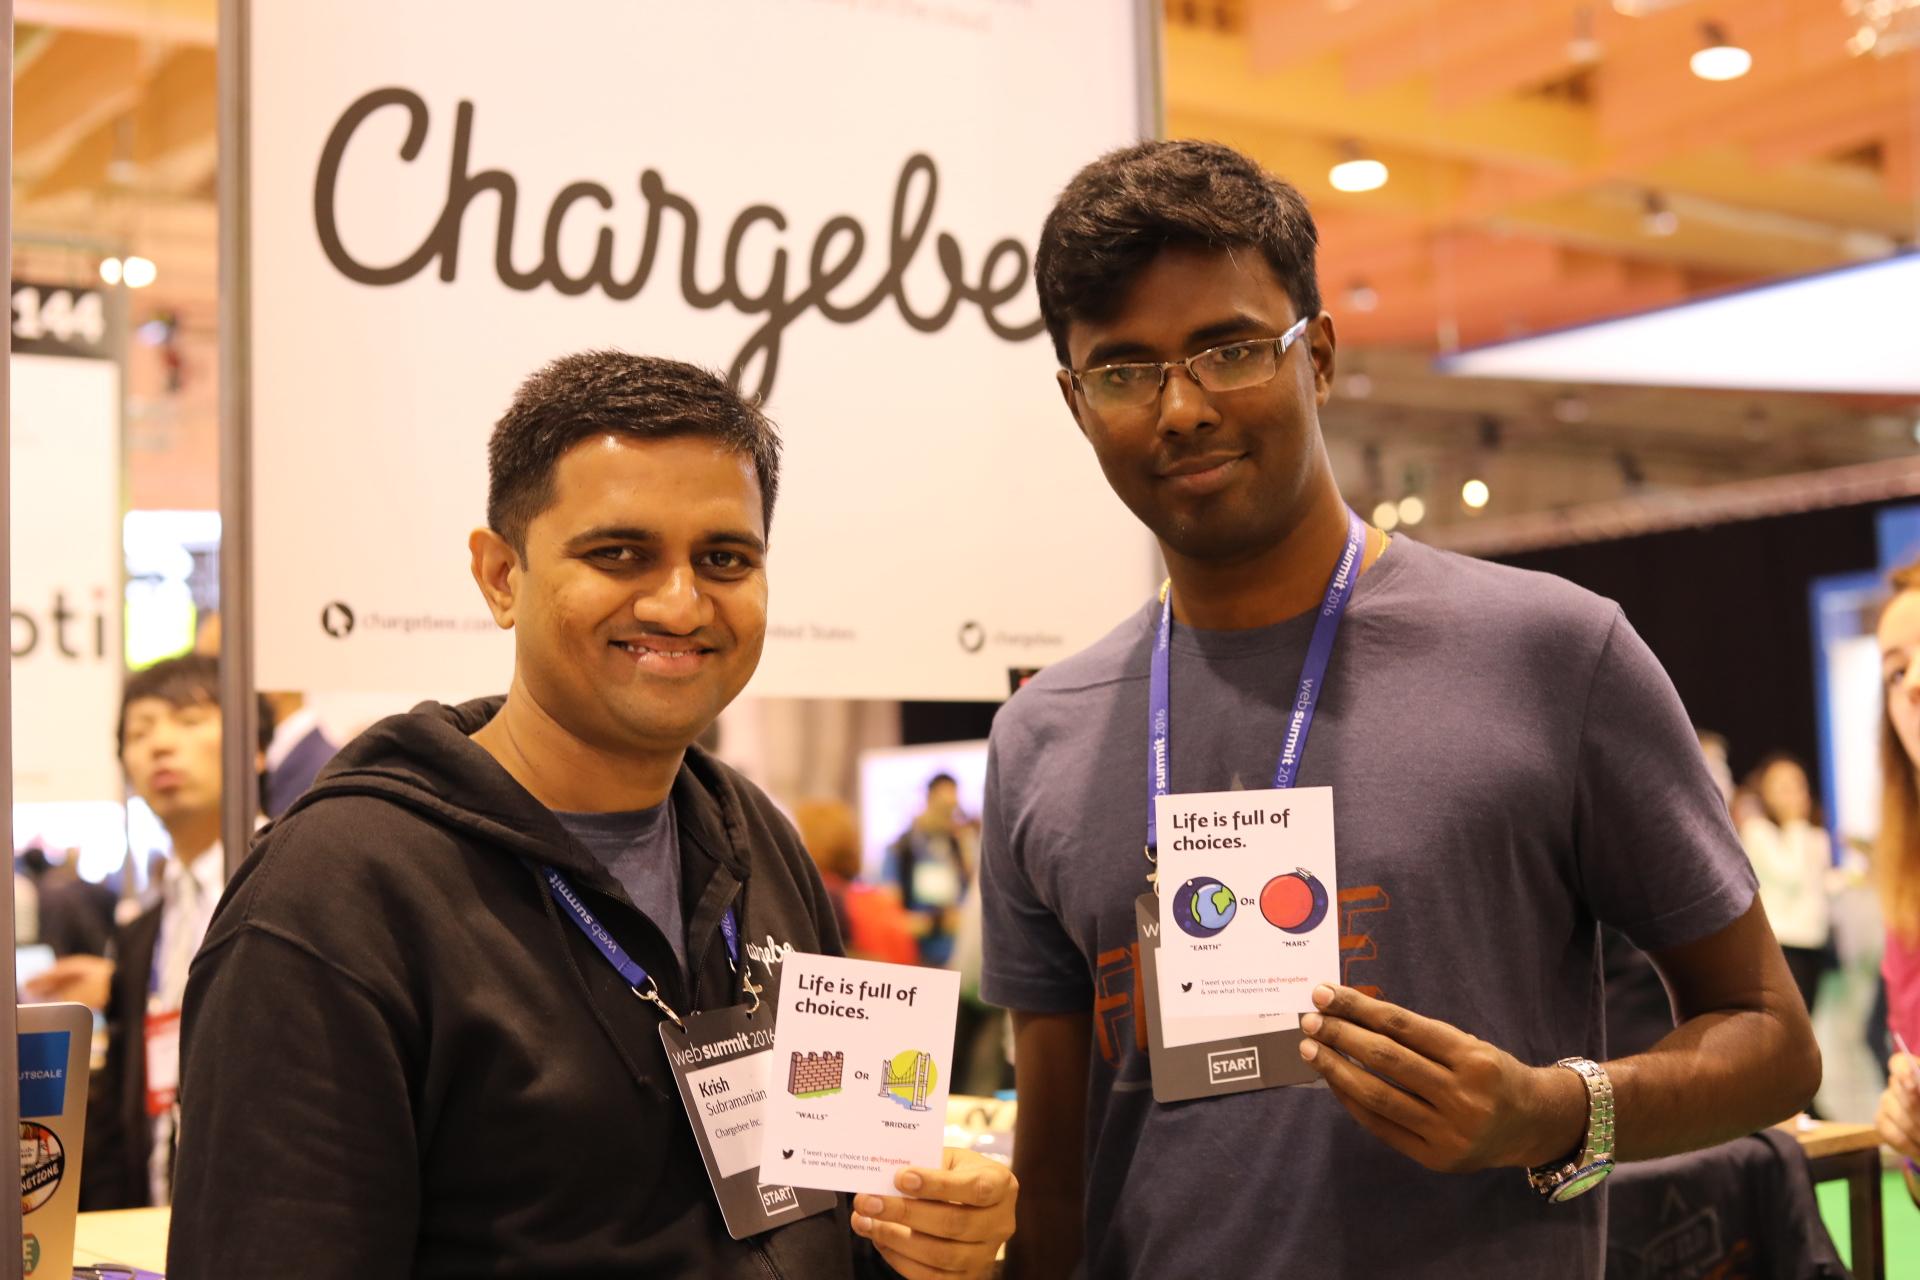 Krish Subramanian, da Chargebee, à esquerda.